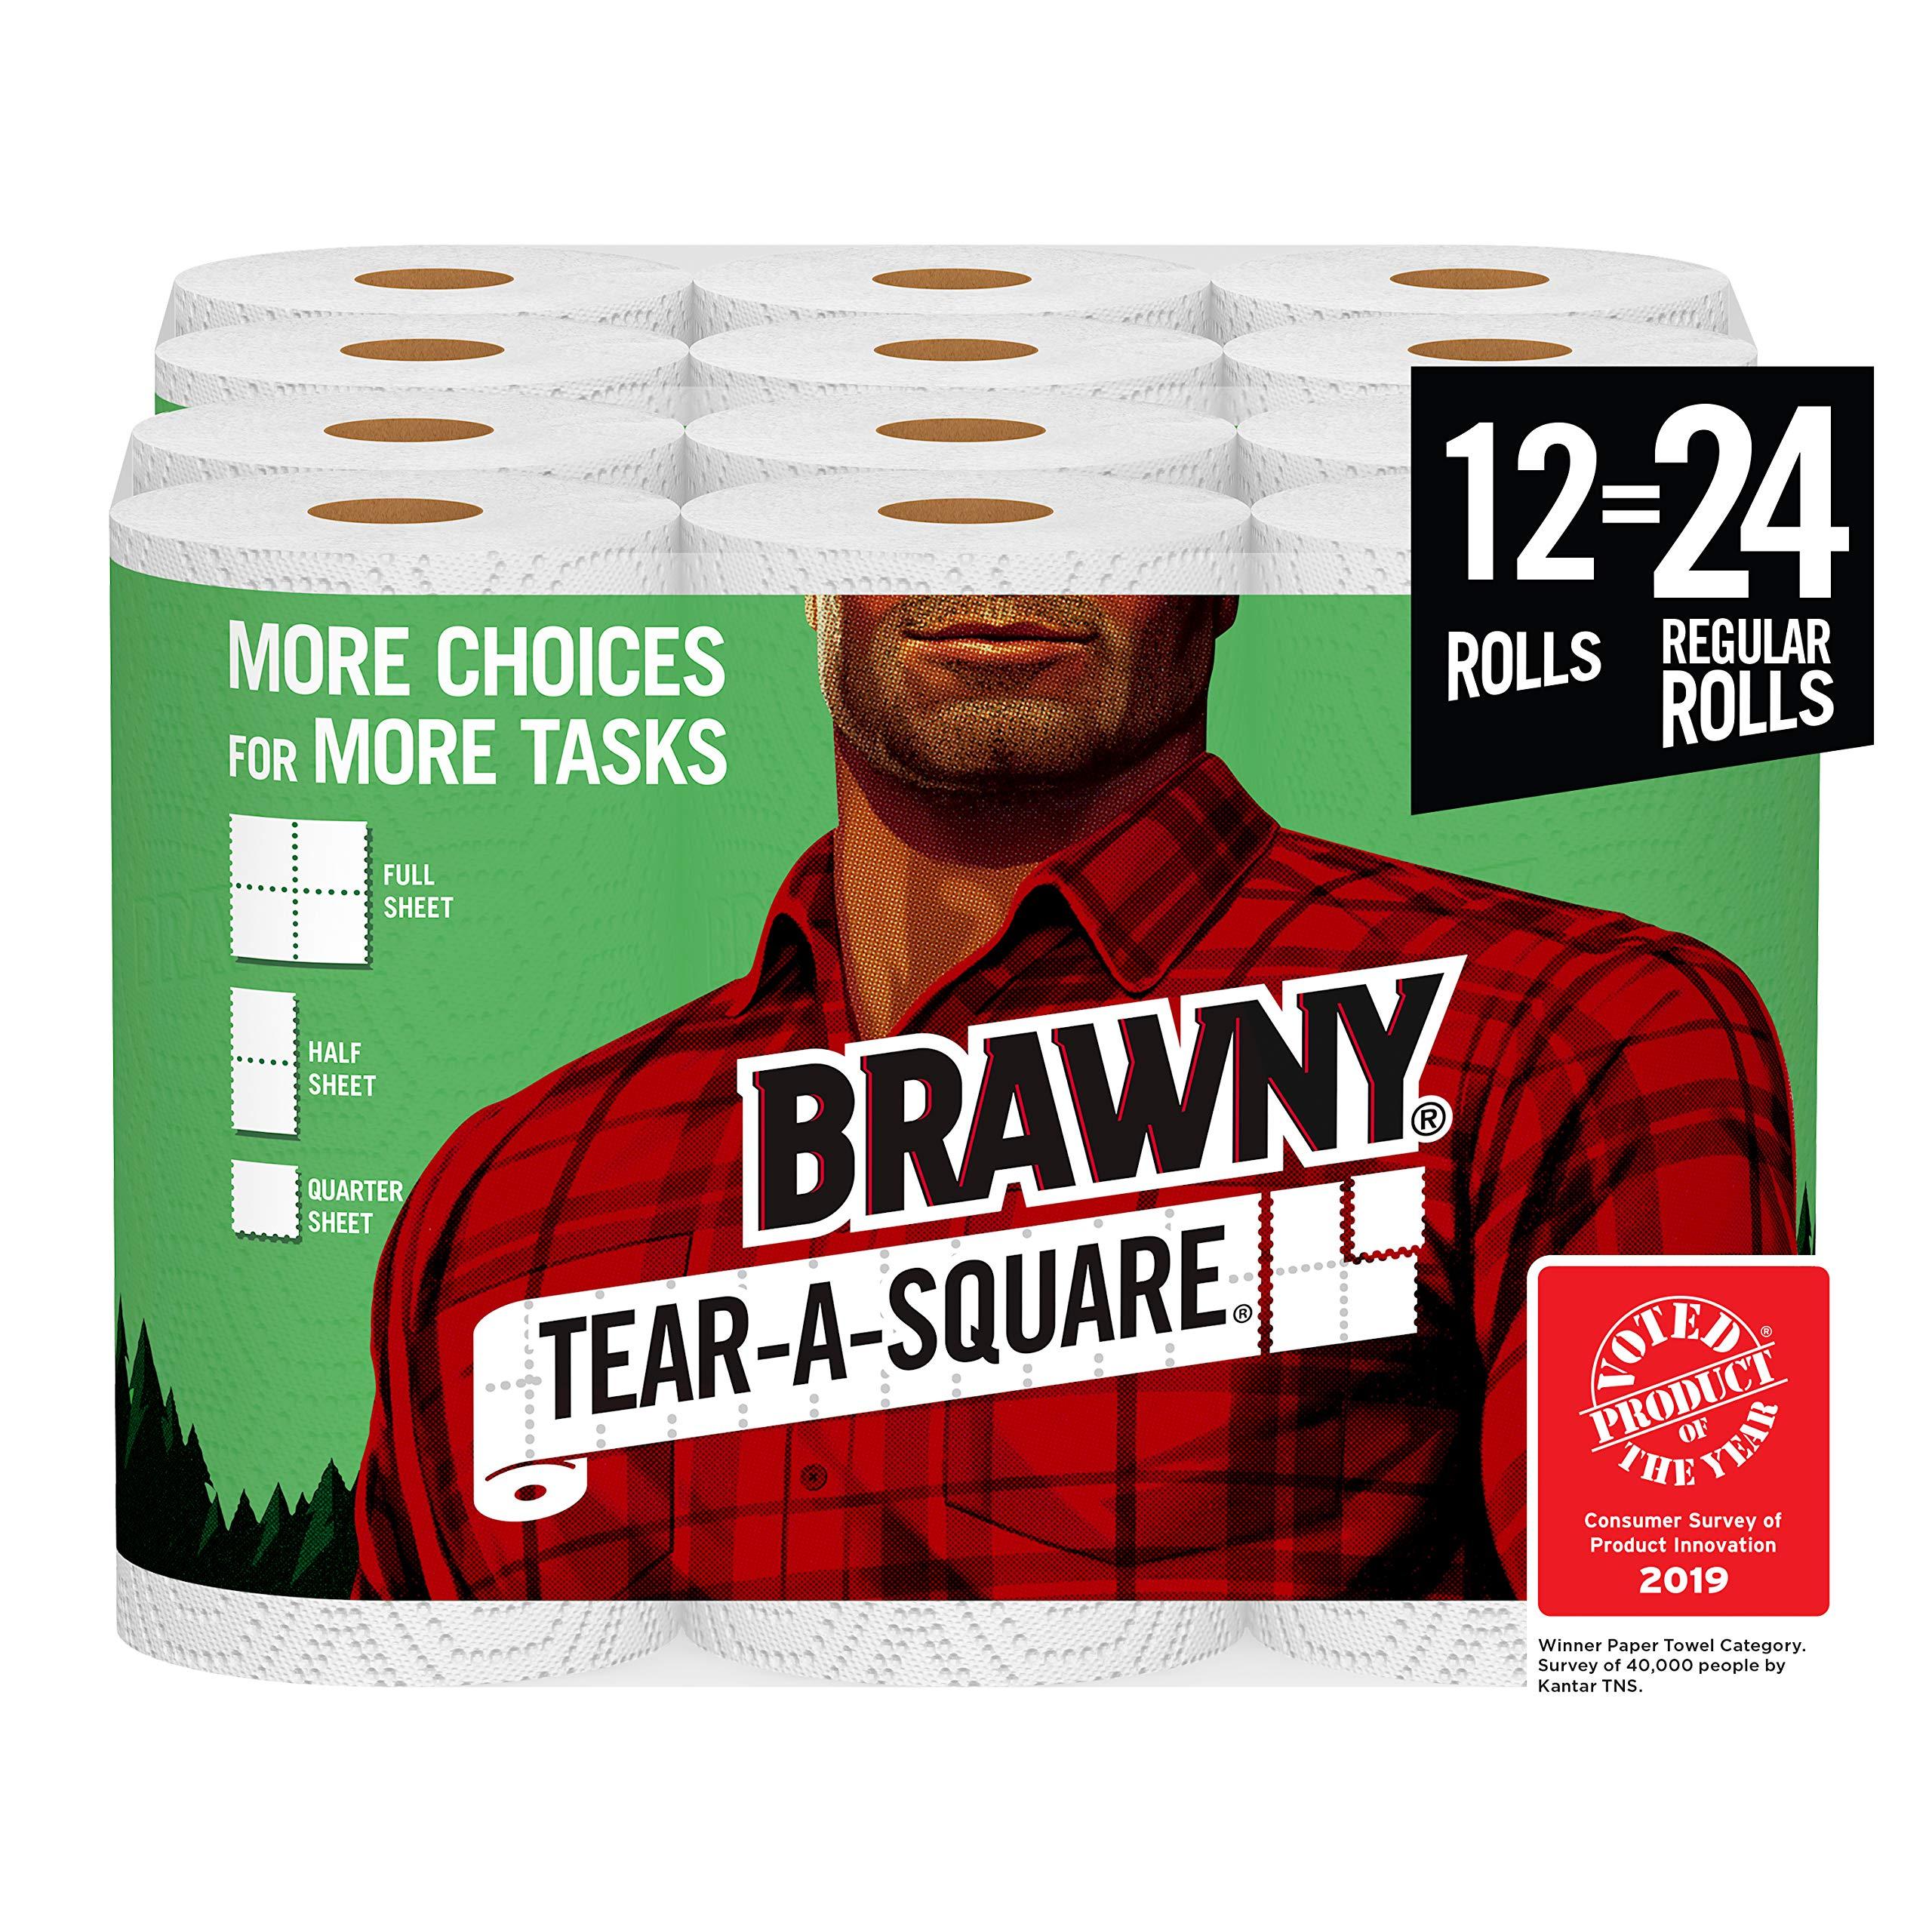 3 Sheet Quarter Size Sheets Tear-A-Square Paper Towels 12 = 24 Regular Rolls